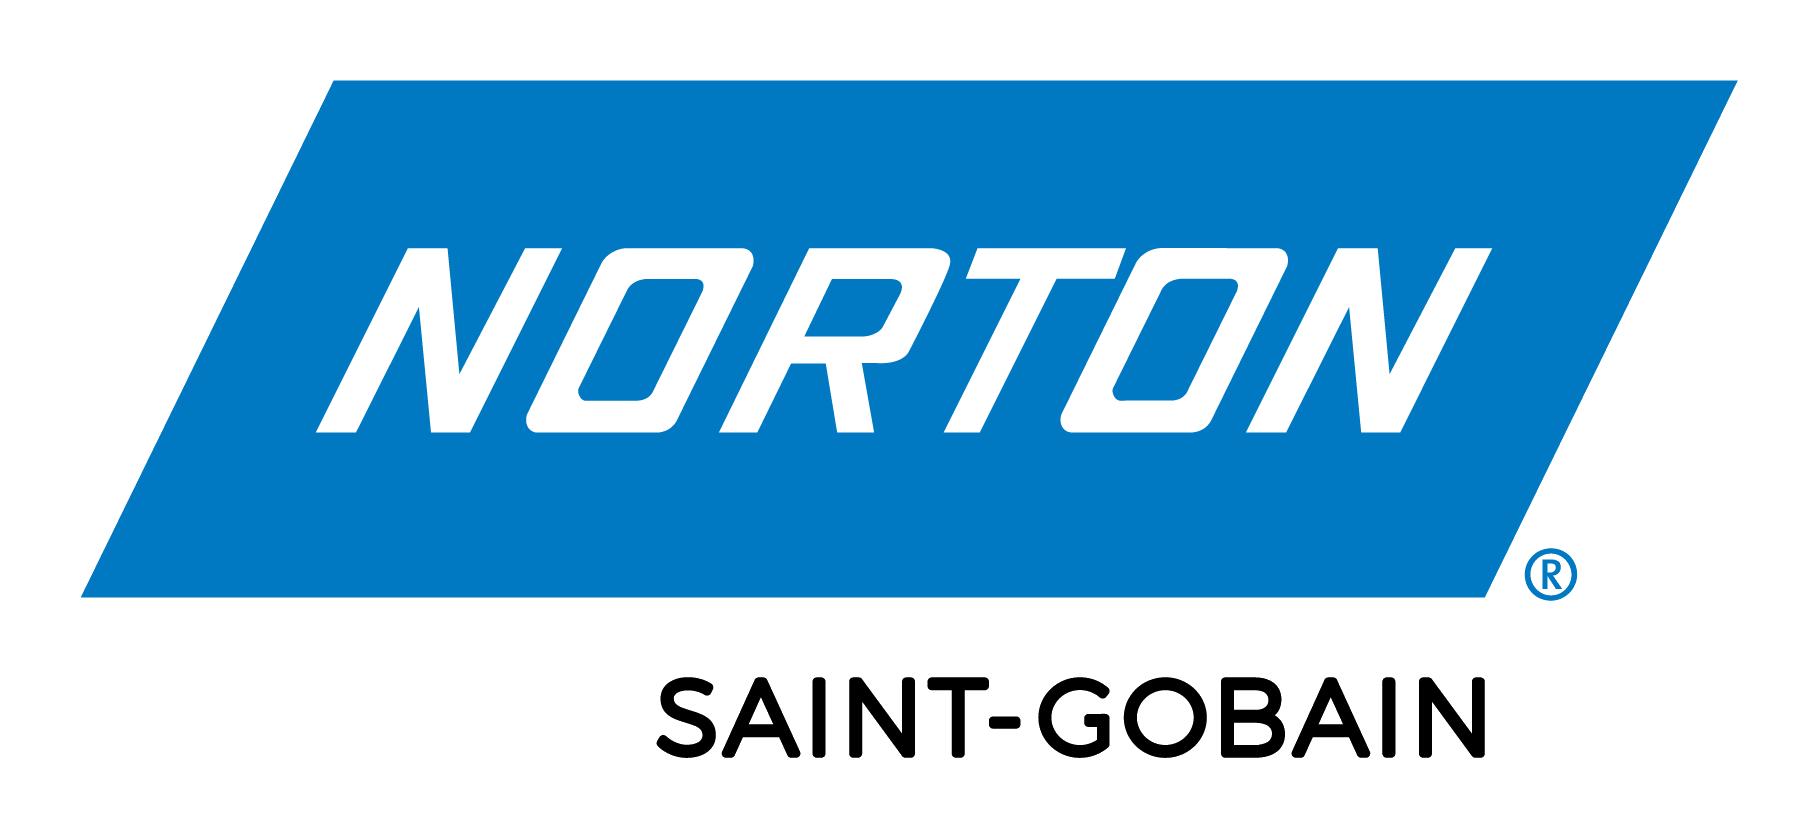 SG_Norton_logo_rgb_23